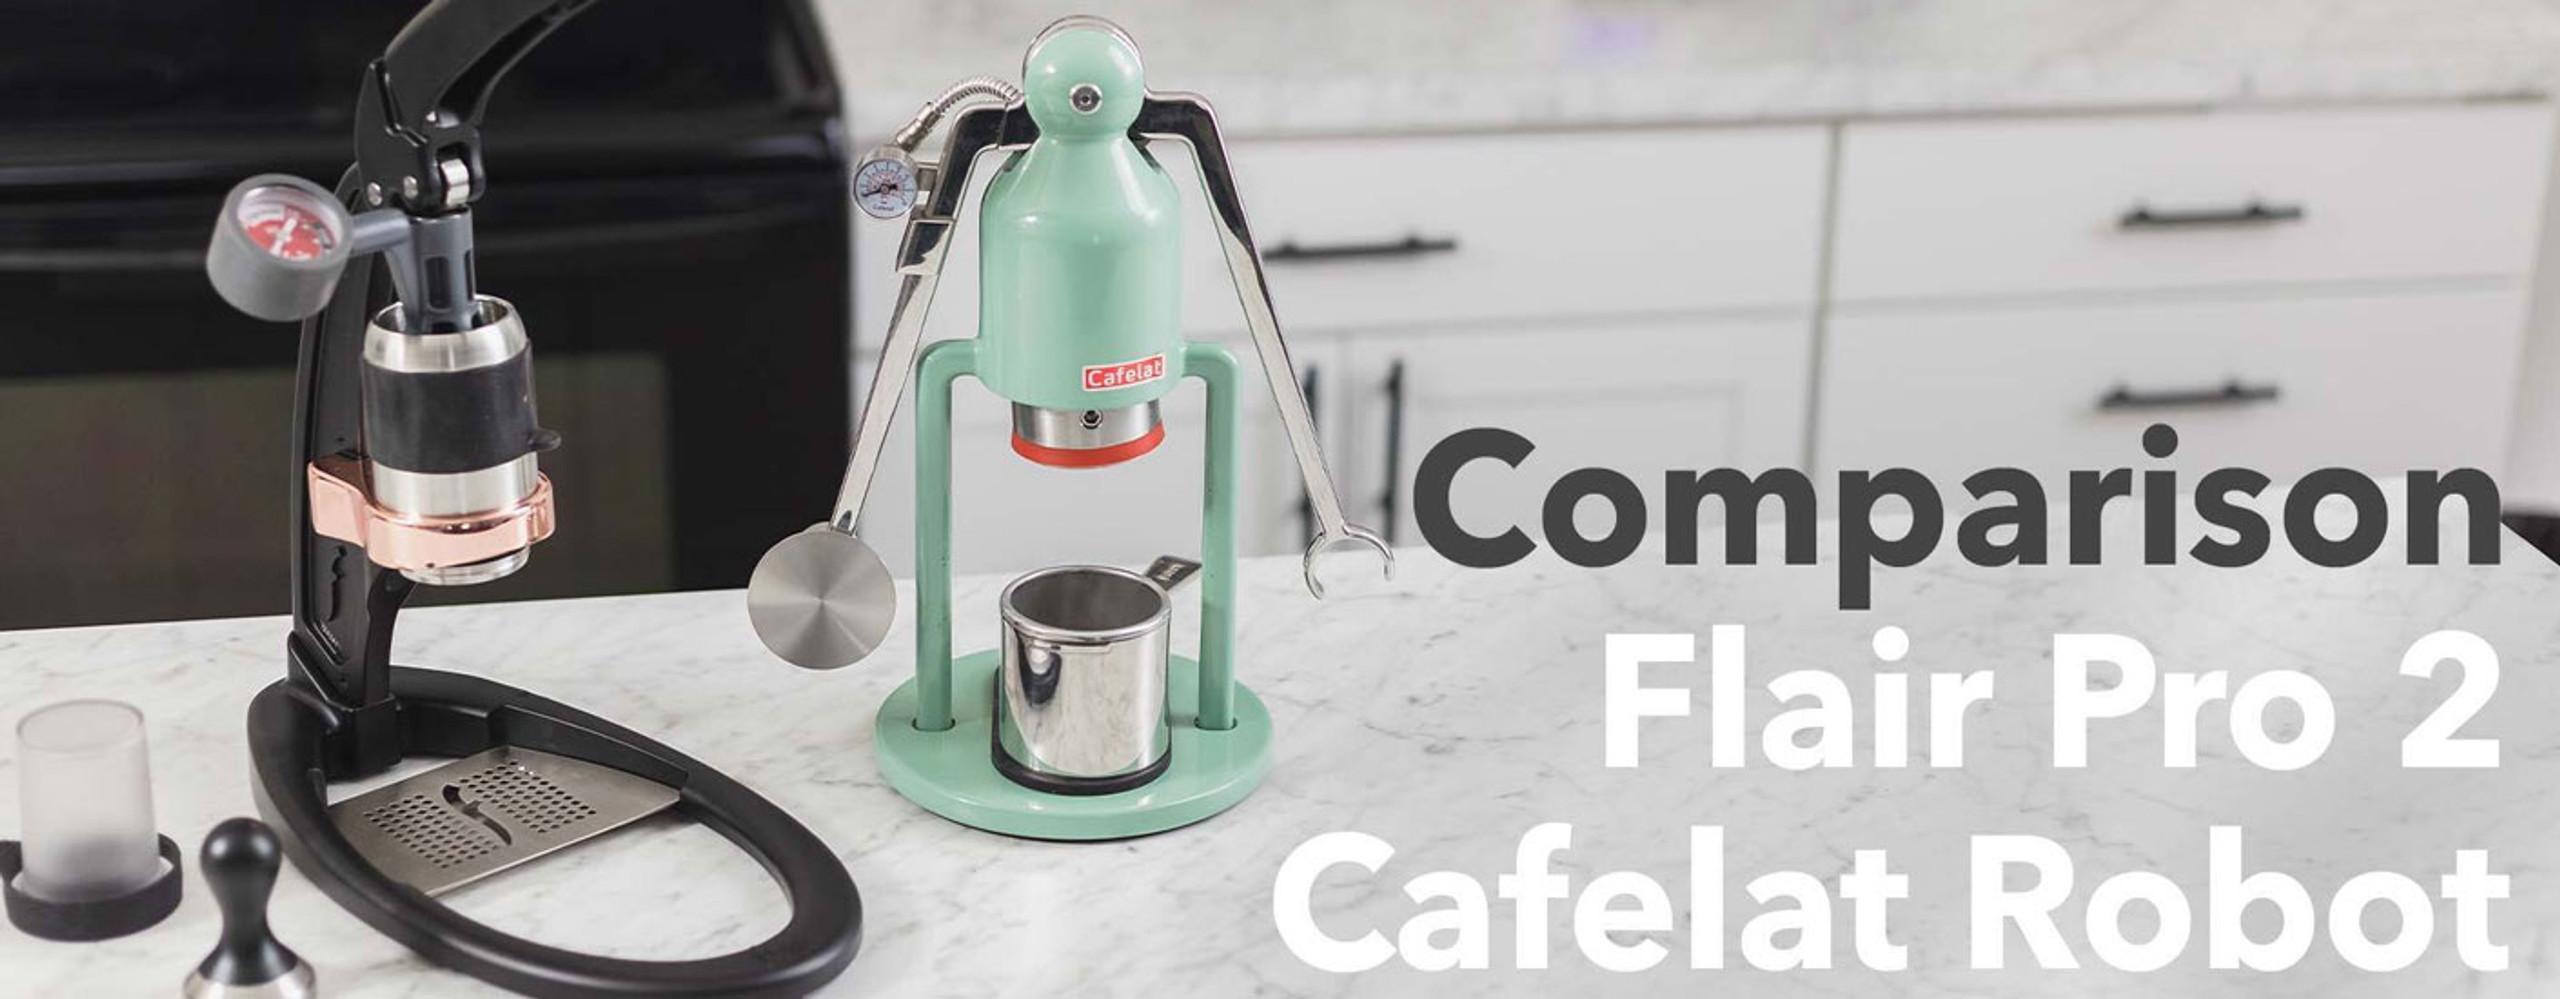 Flair Pro 2 vs. Cafelat Robot